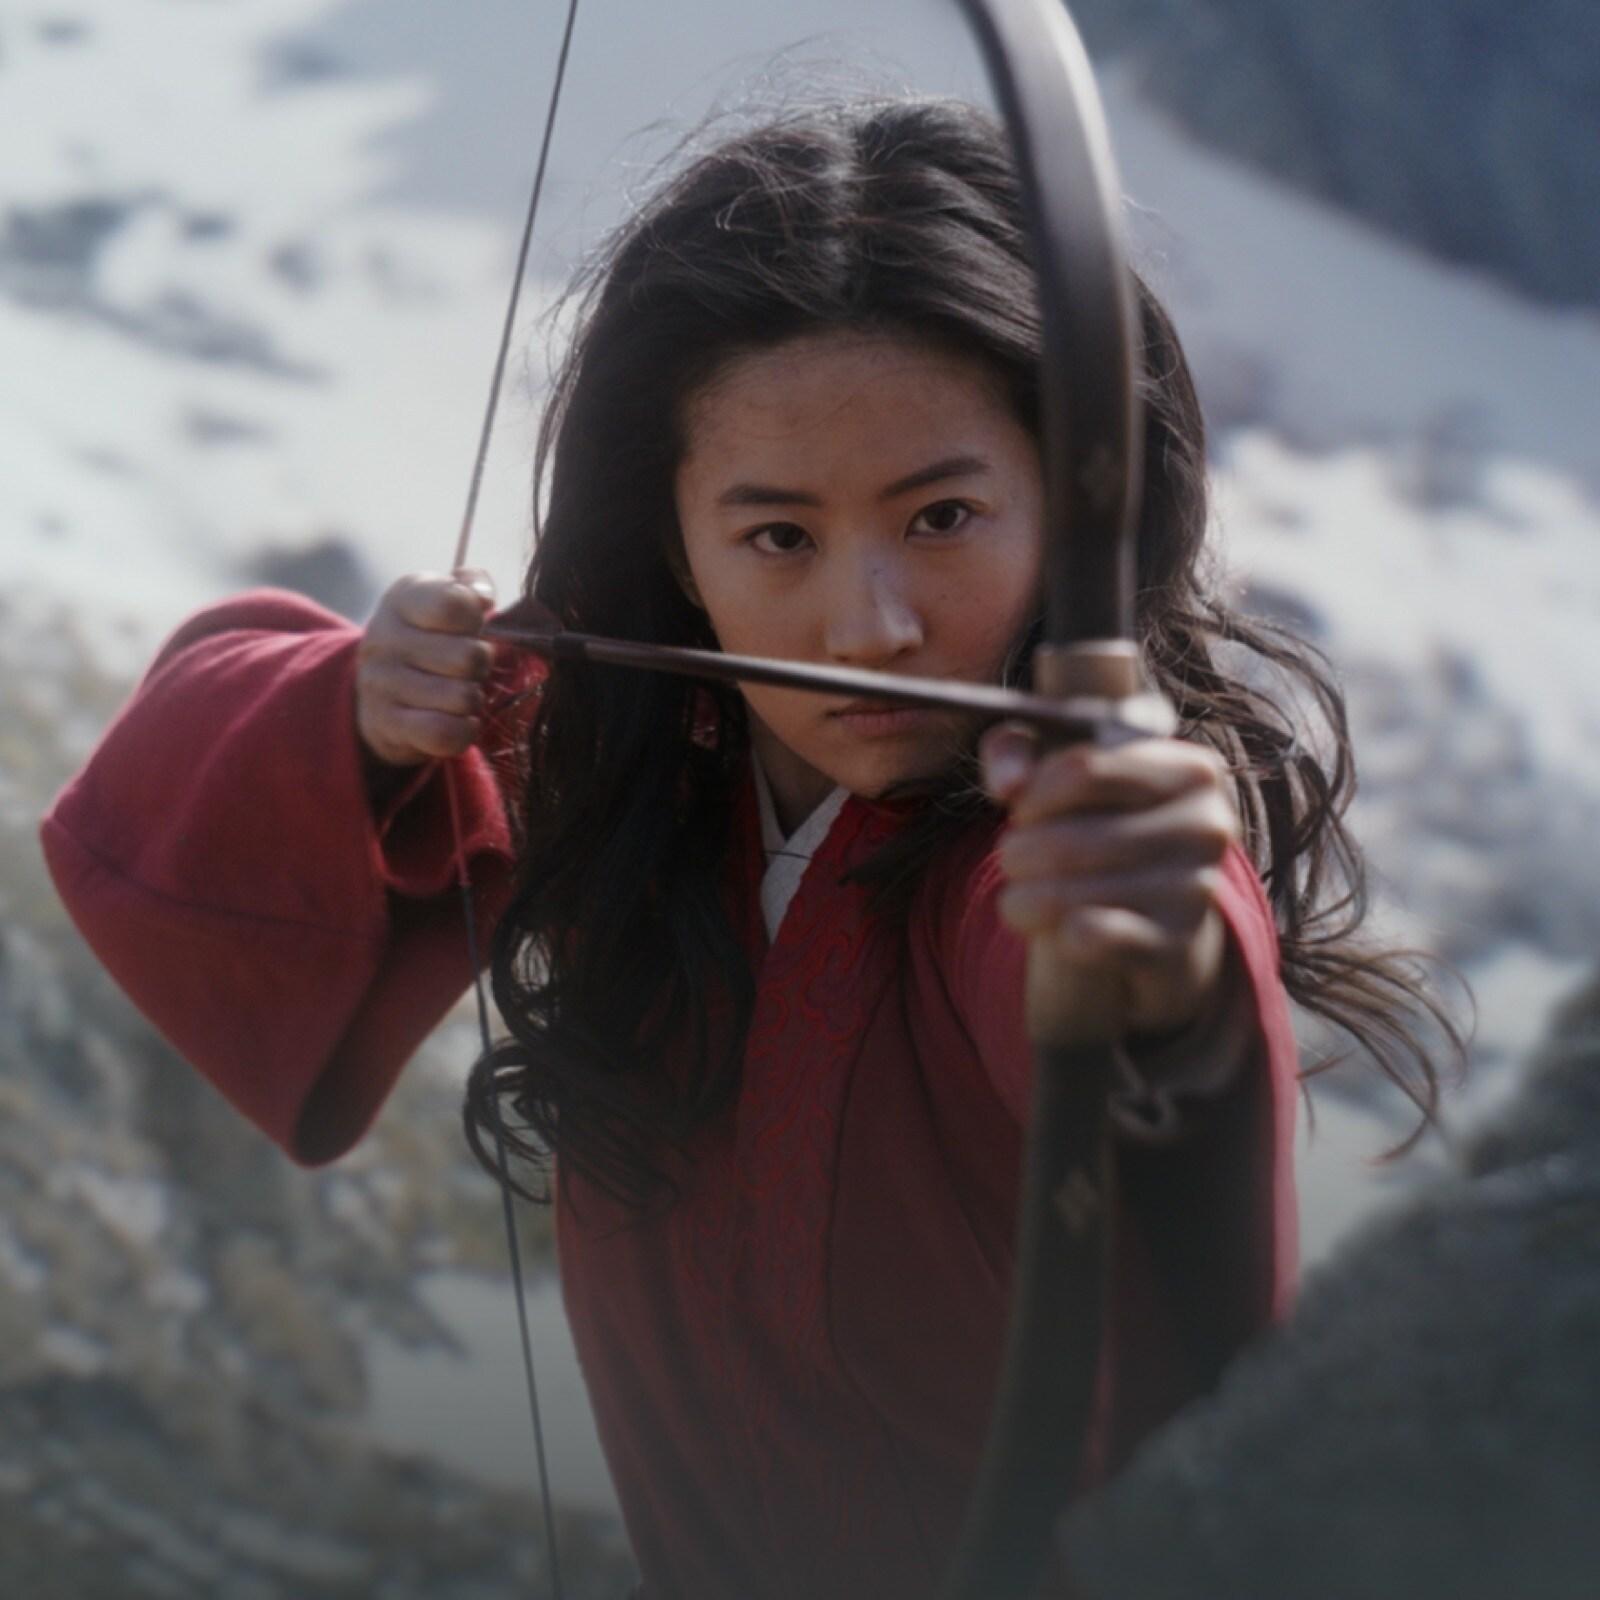 Mulán mirando com o arco e flecha